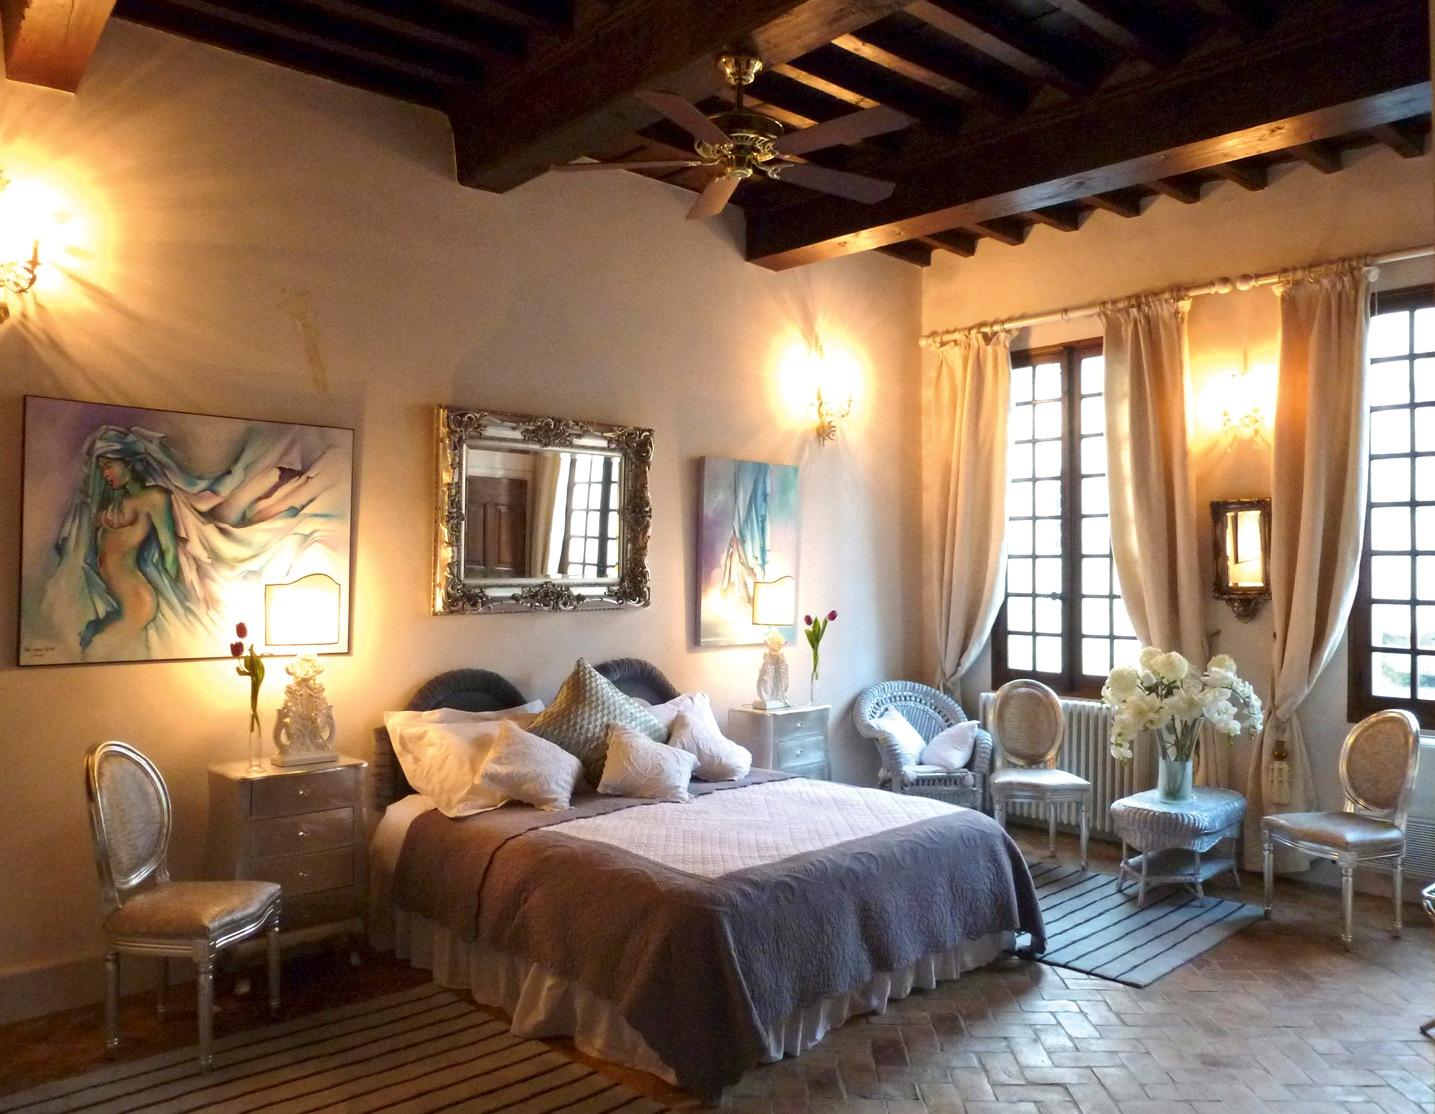 les saisons bed and breakfast villeneuve les avignon provence winter room chambre l 39 hiver. Black Bedroom Furniture Sets. Home Design Ideas